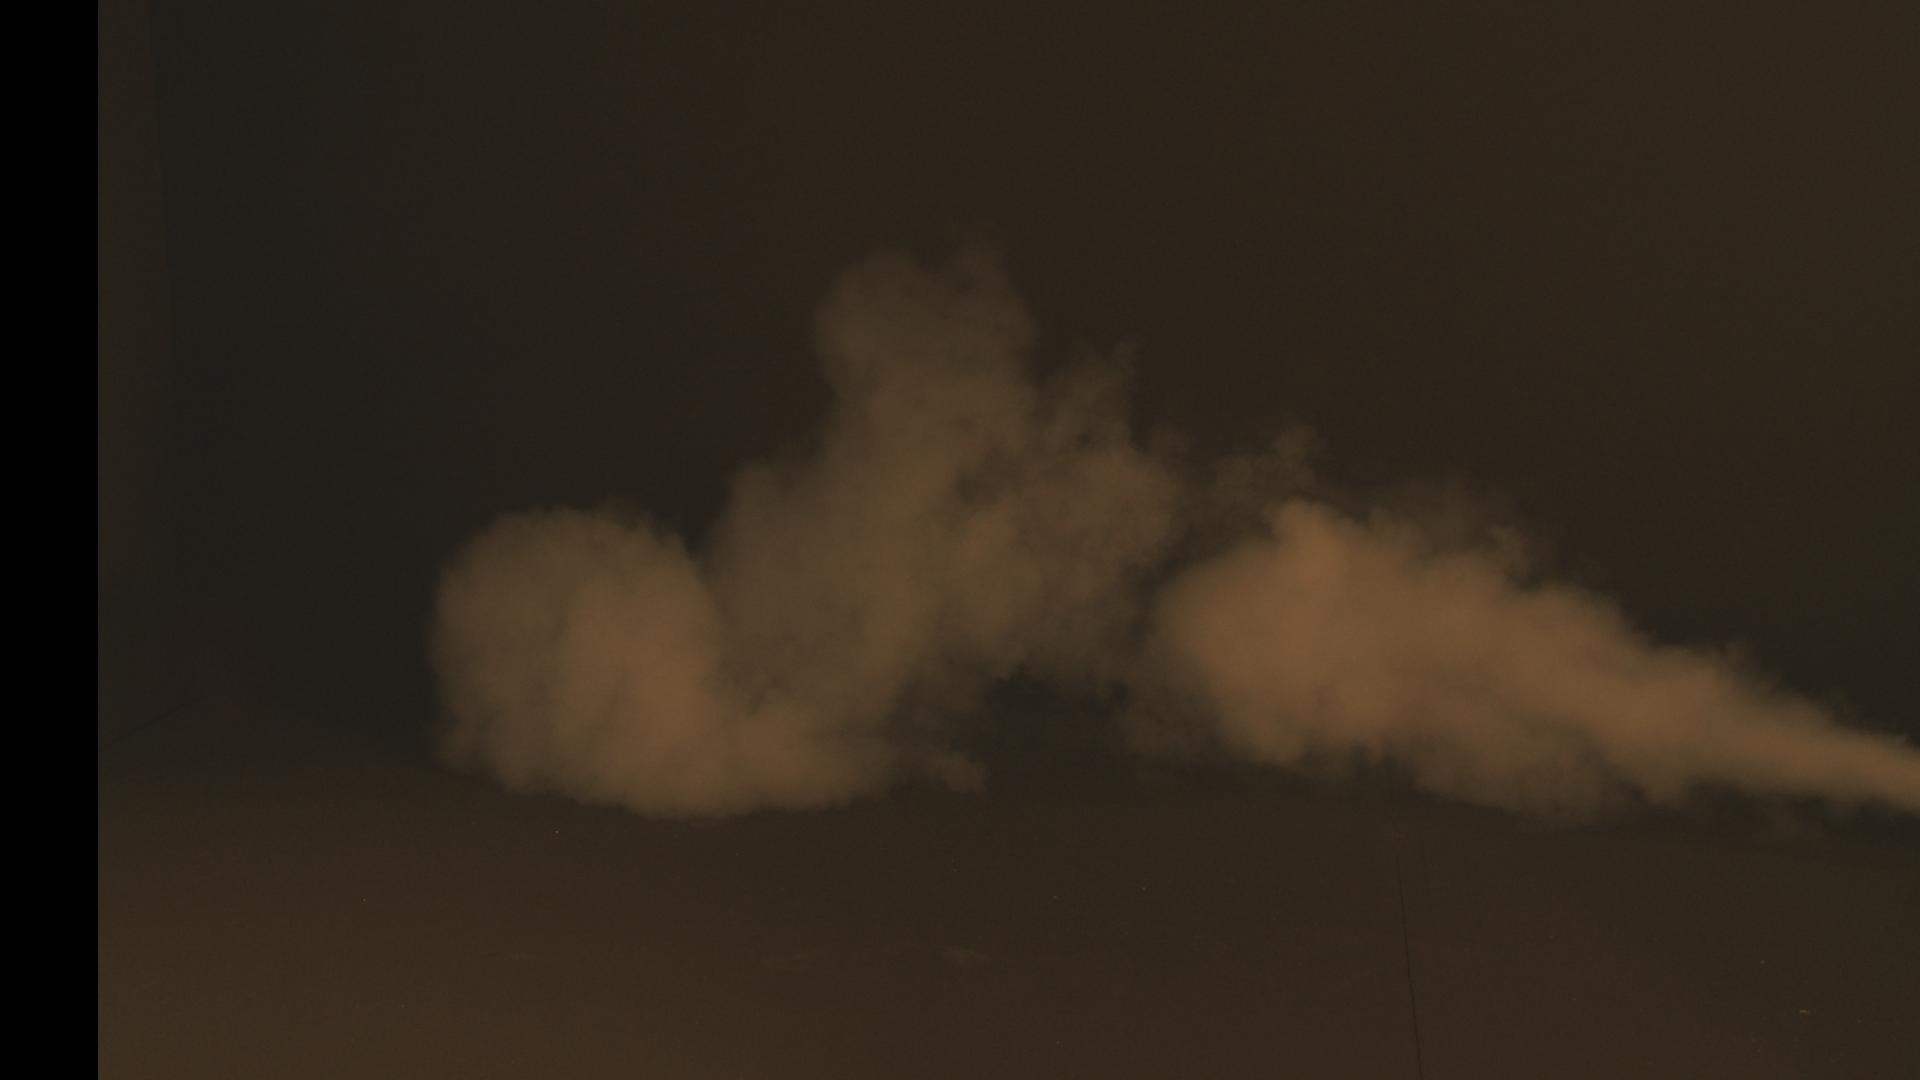 Smoke Effect Png Png Image - Smoke Effect, Transparent background PNG HD thumbnail